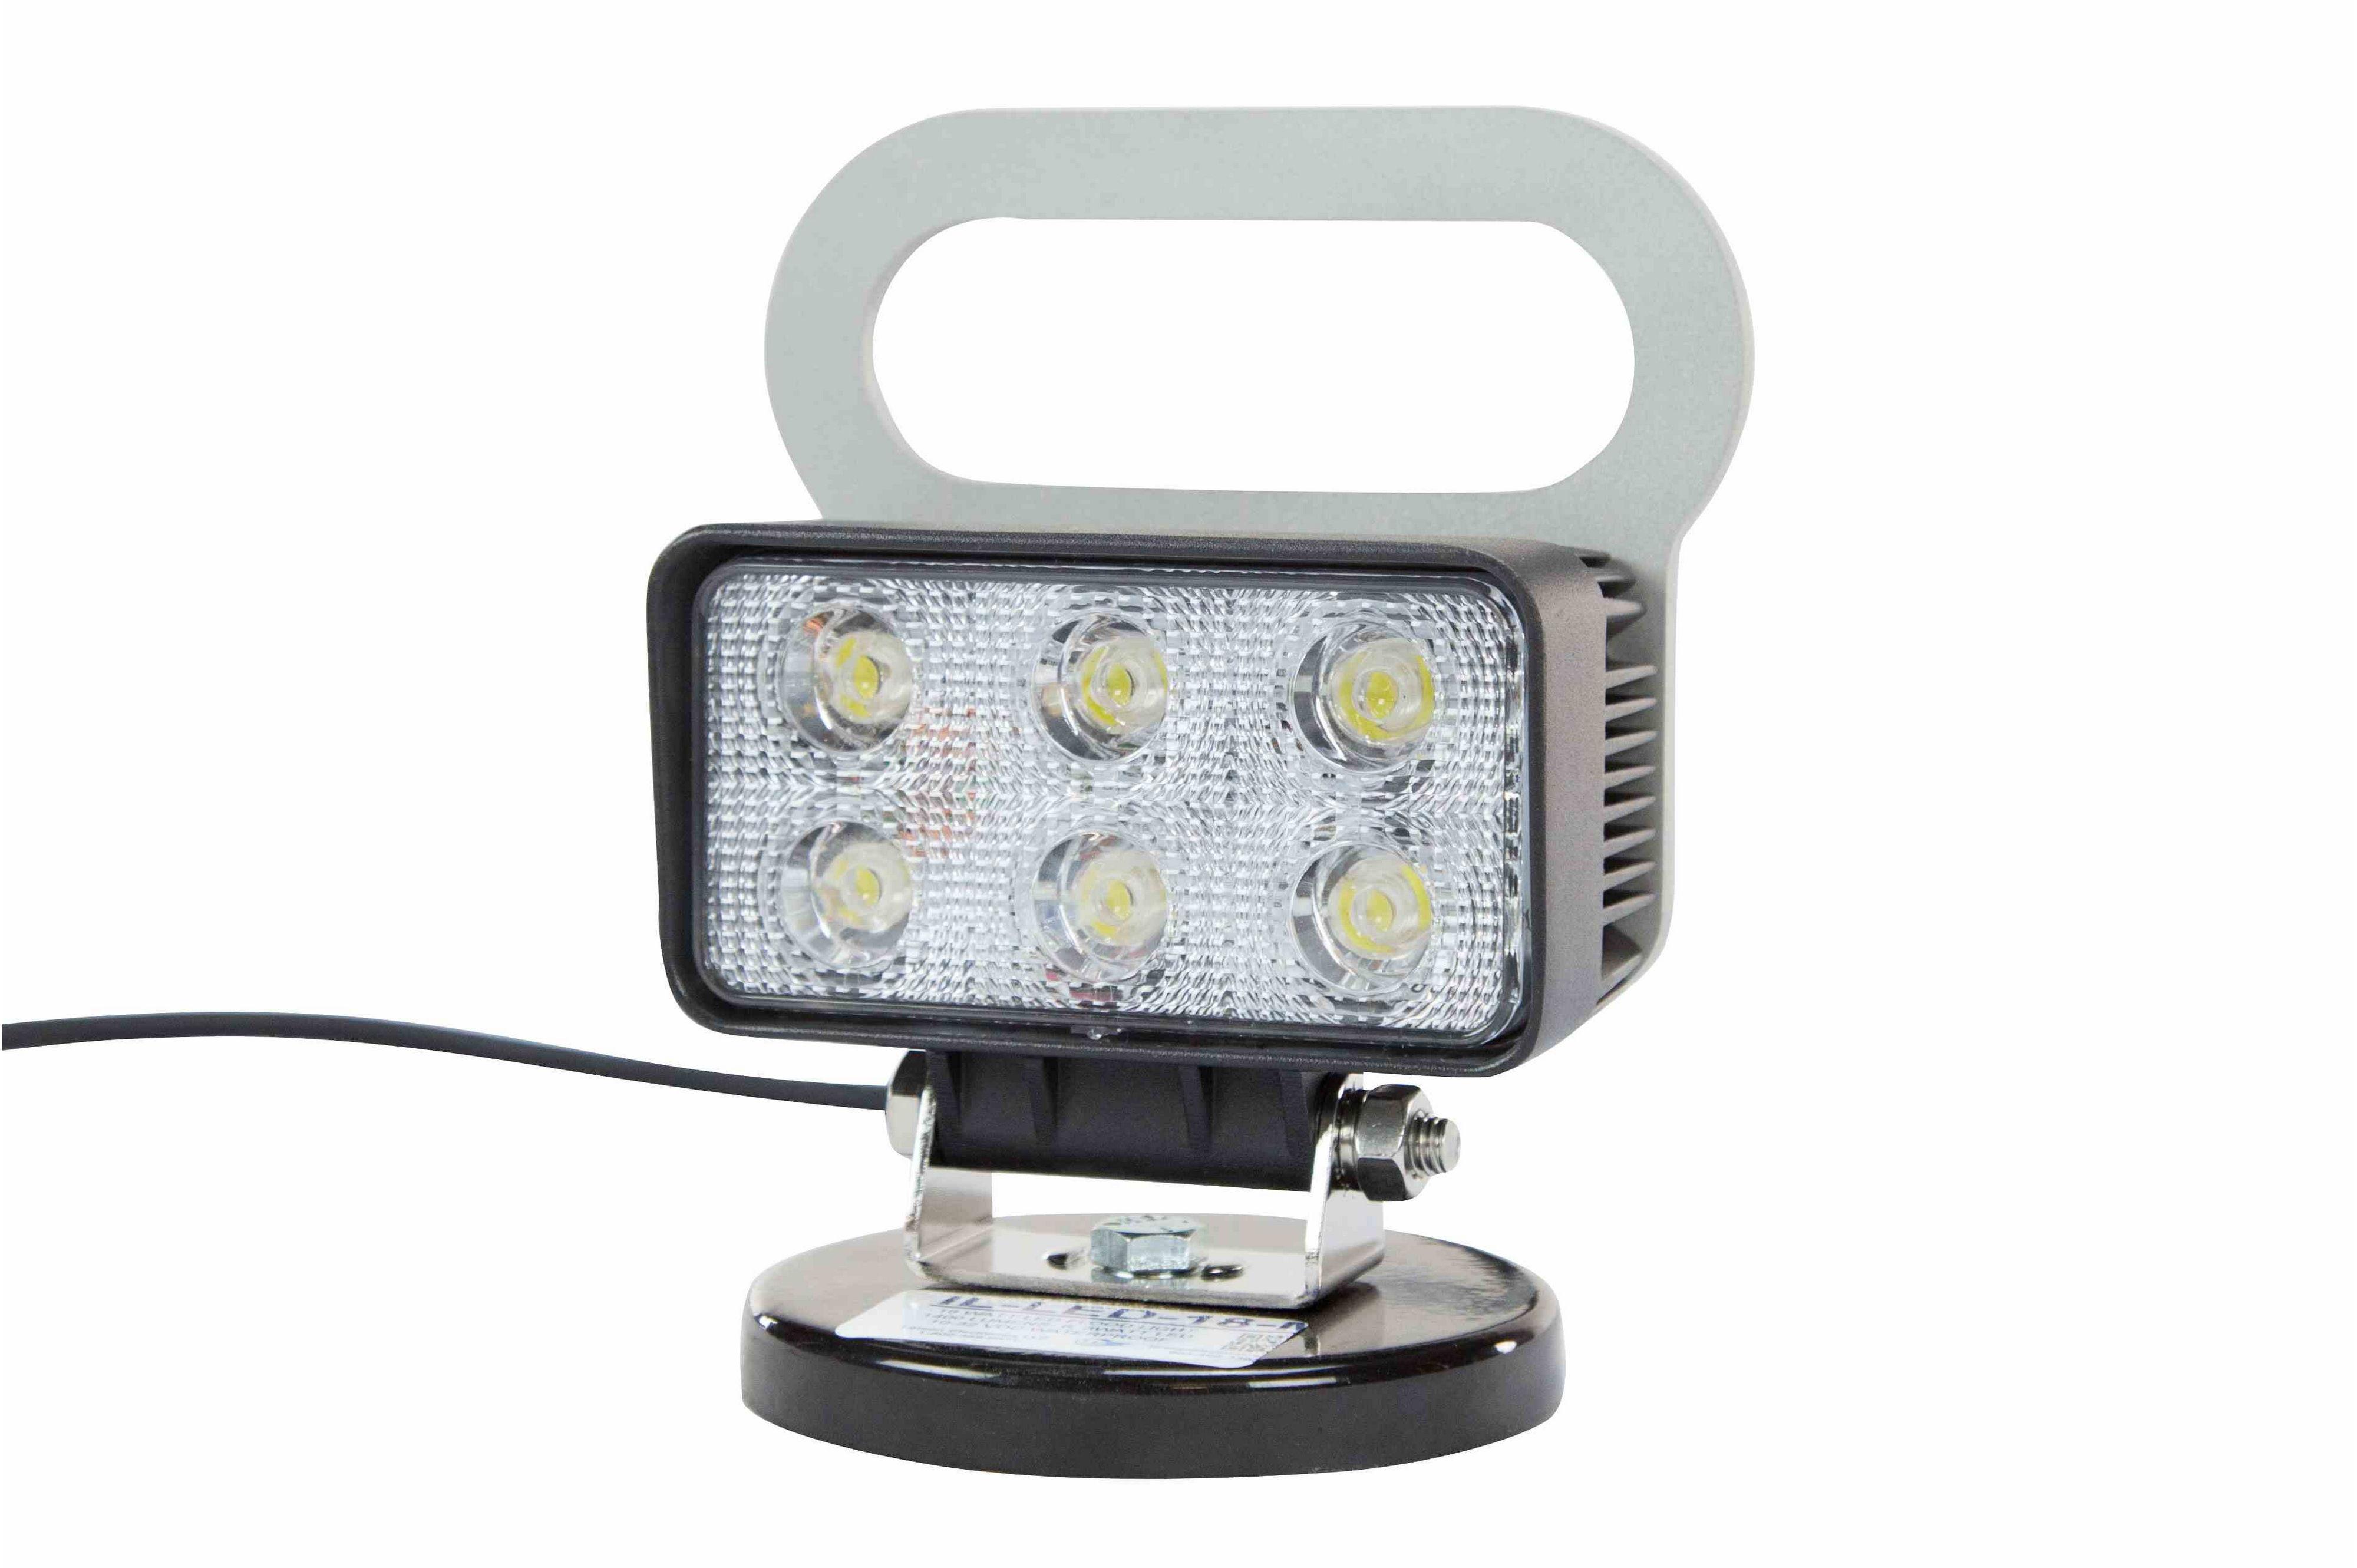 18 watt led flood light magnetic base 1400 lumens six 3 watt leds 10 32 volt dc ip67. Black Bedroom Furniture Sets. Home Design Ideas